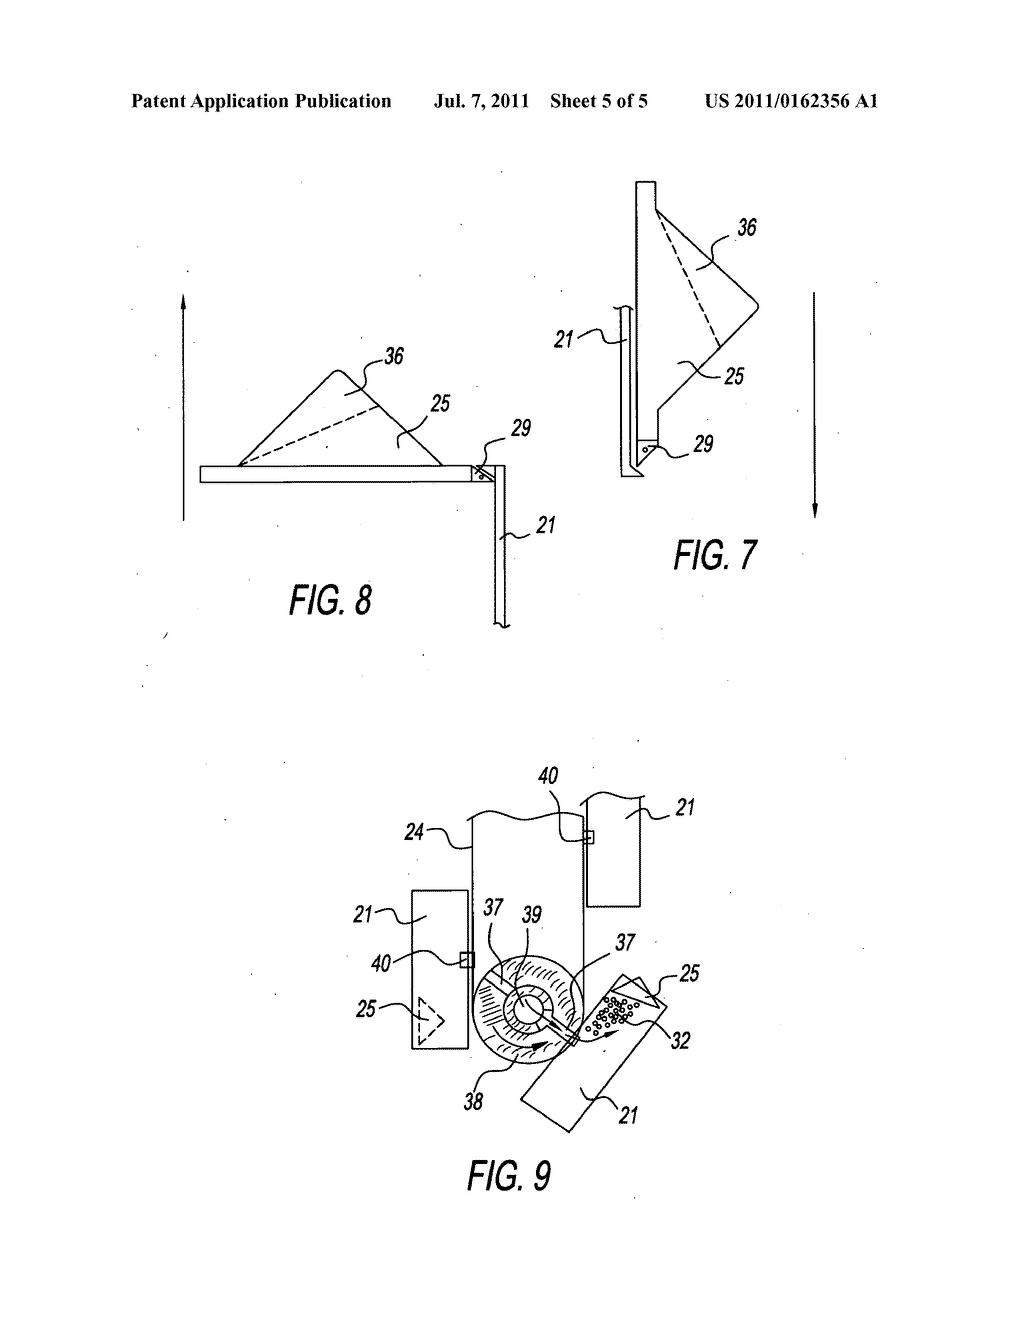 rotational gravity buoyancy power generator diagram, schematicrotational gravity buoyancy power generator diagram, schematic, and image 06